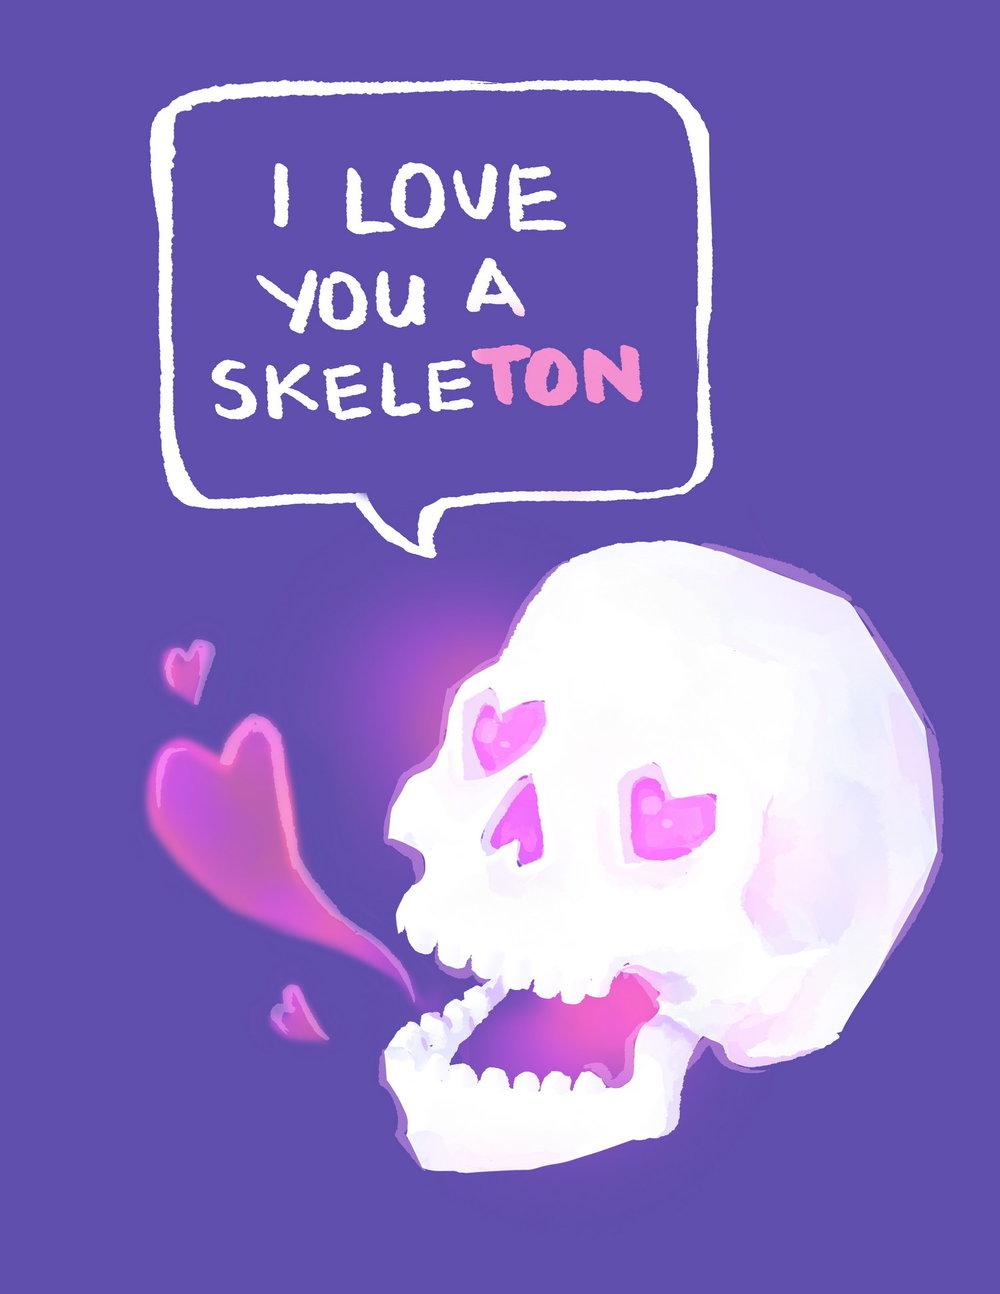 I Love You A Skeleton